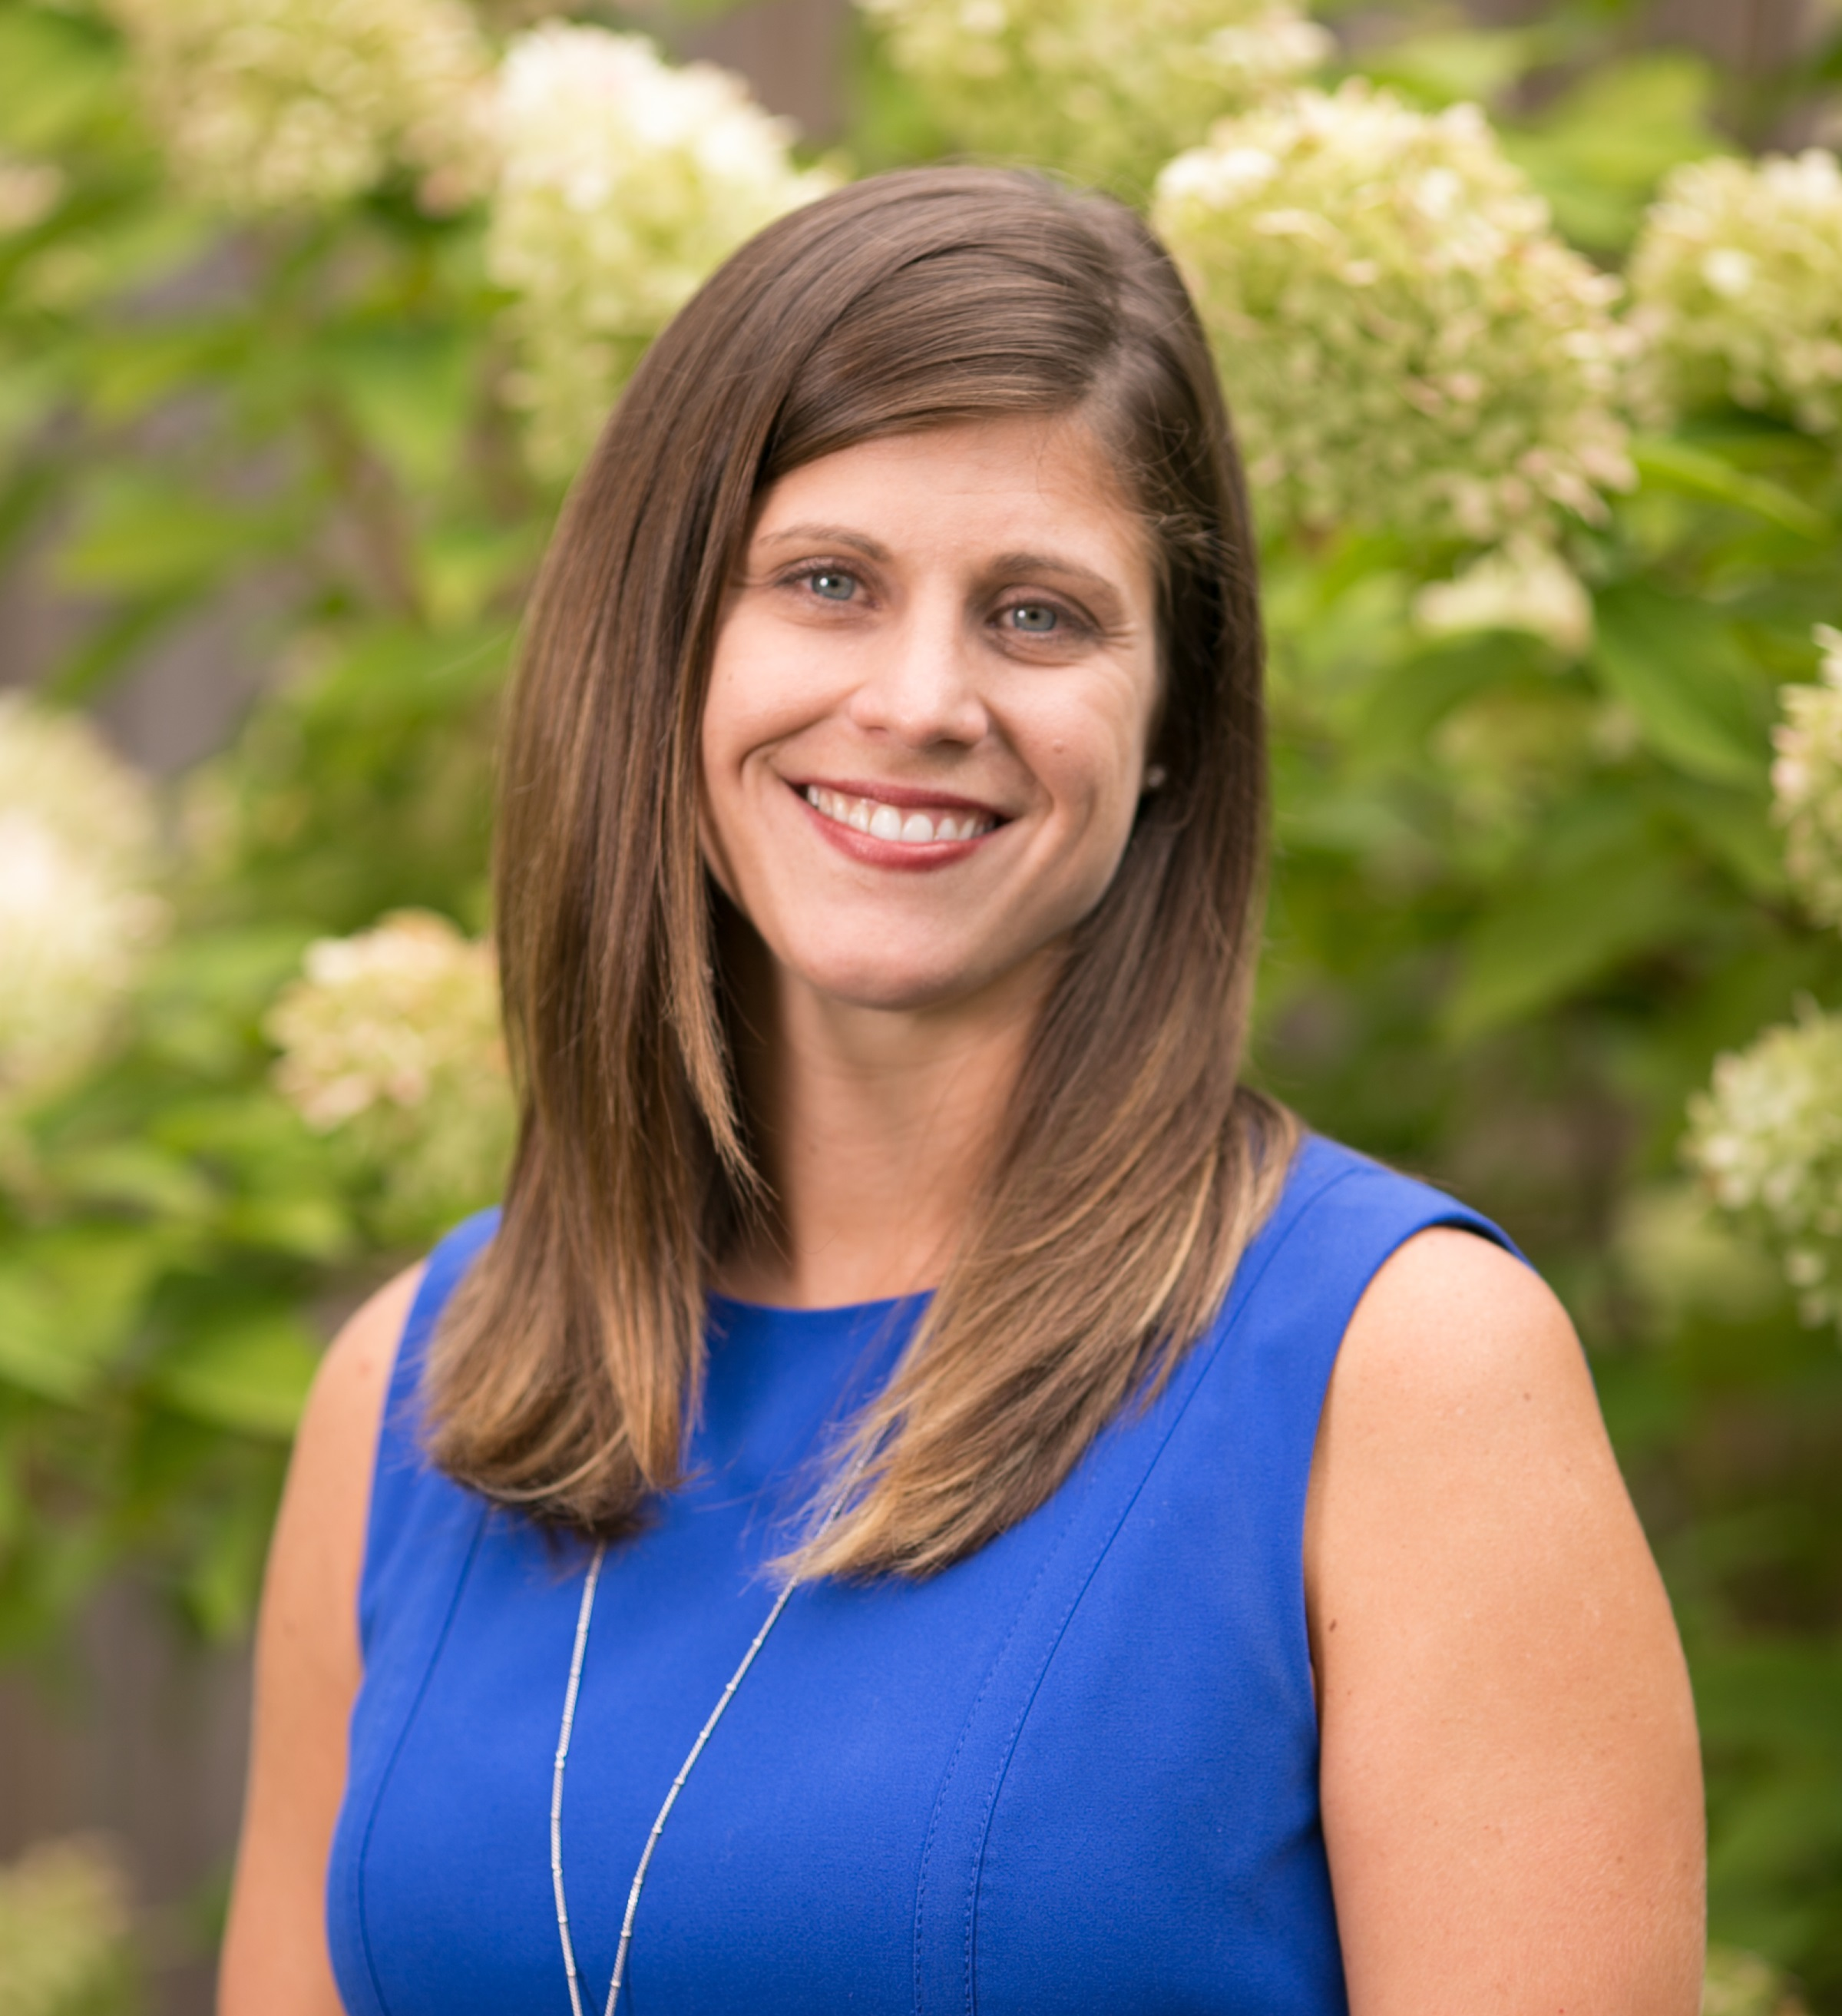 Rebekah Brubaker, LPC